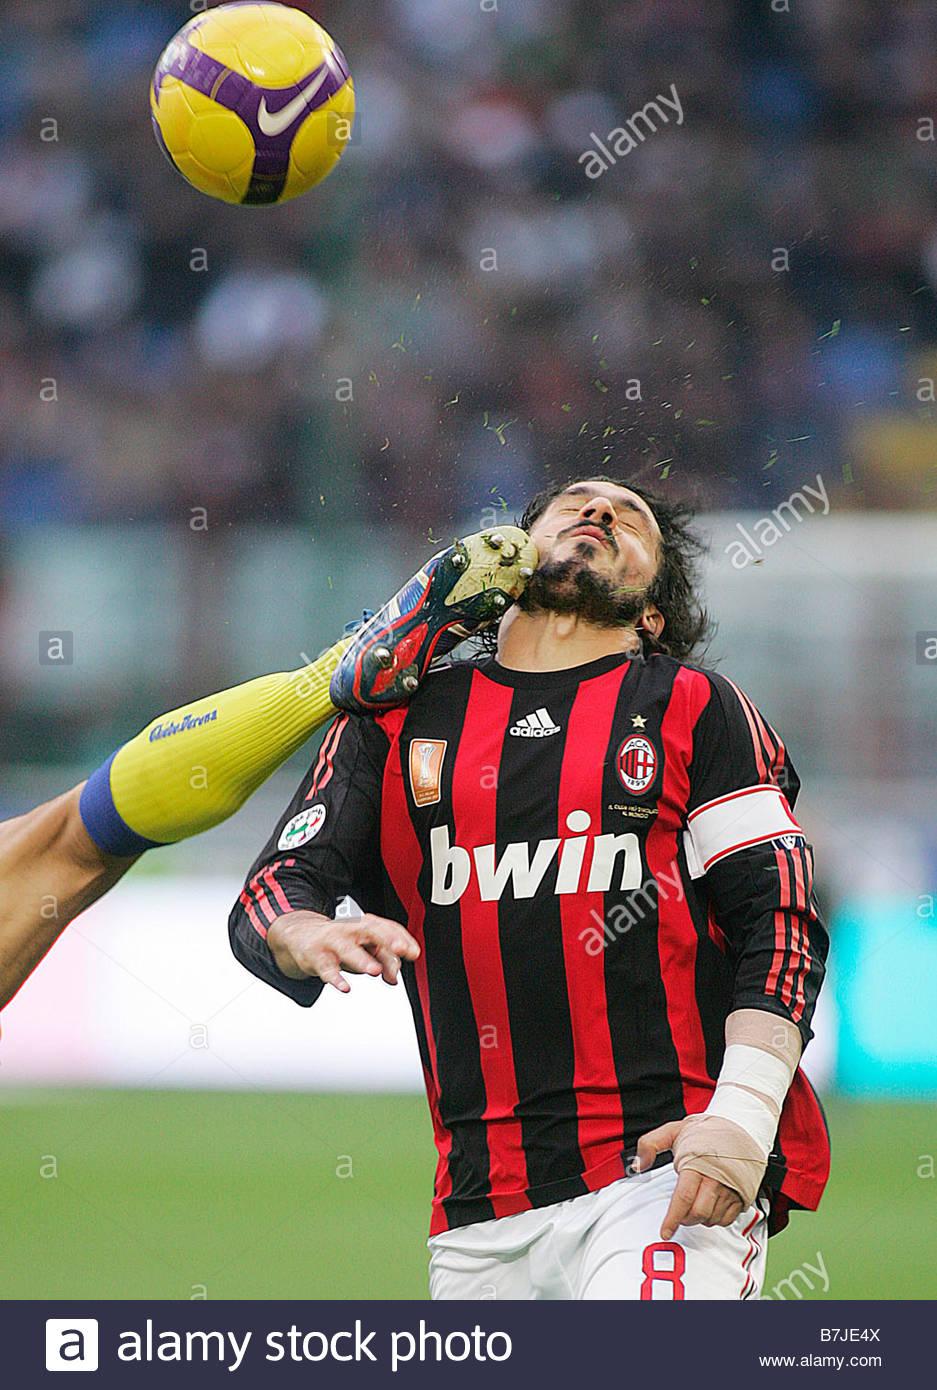 gennaro gattuso'milan 16-11-2008 'milan-chievo 1-0 'italian soccer championship 2008-2009, serie a'milan-chievo - Stock Image